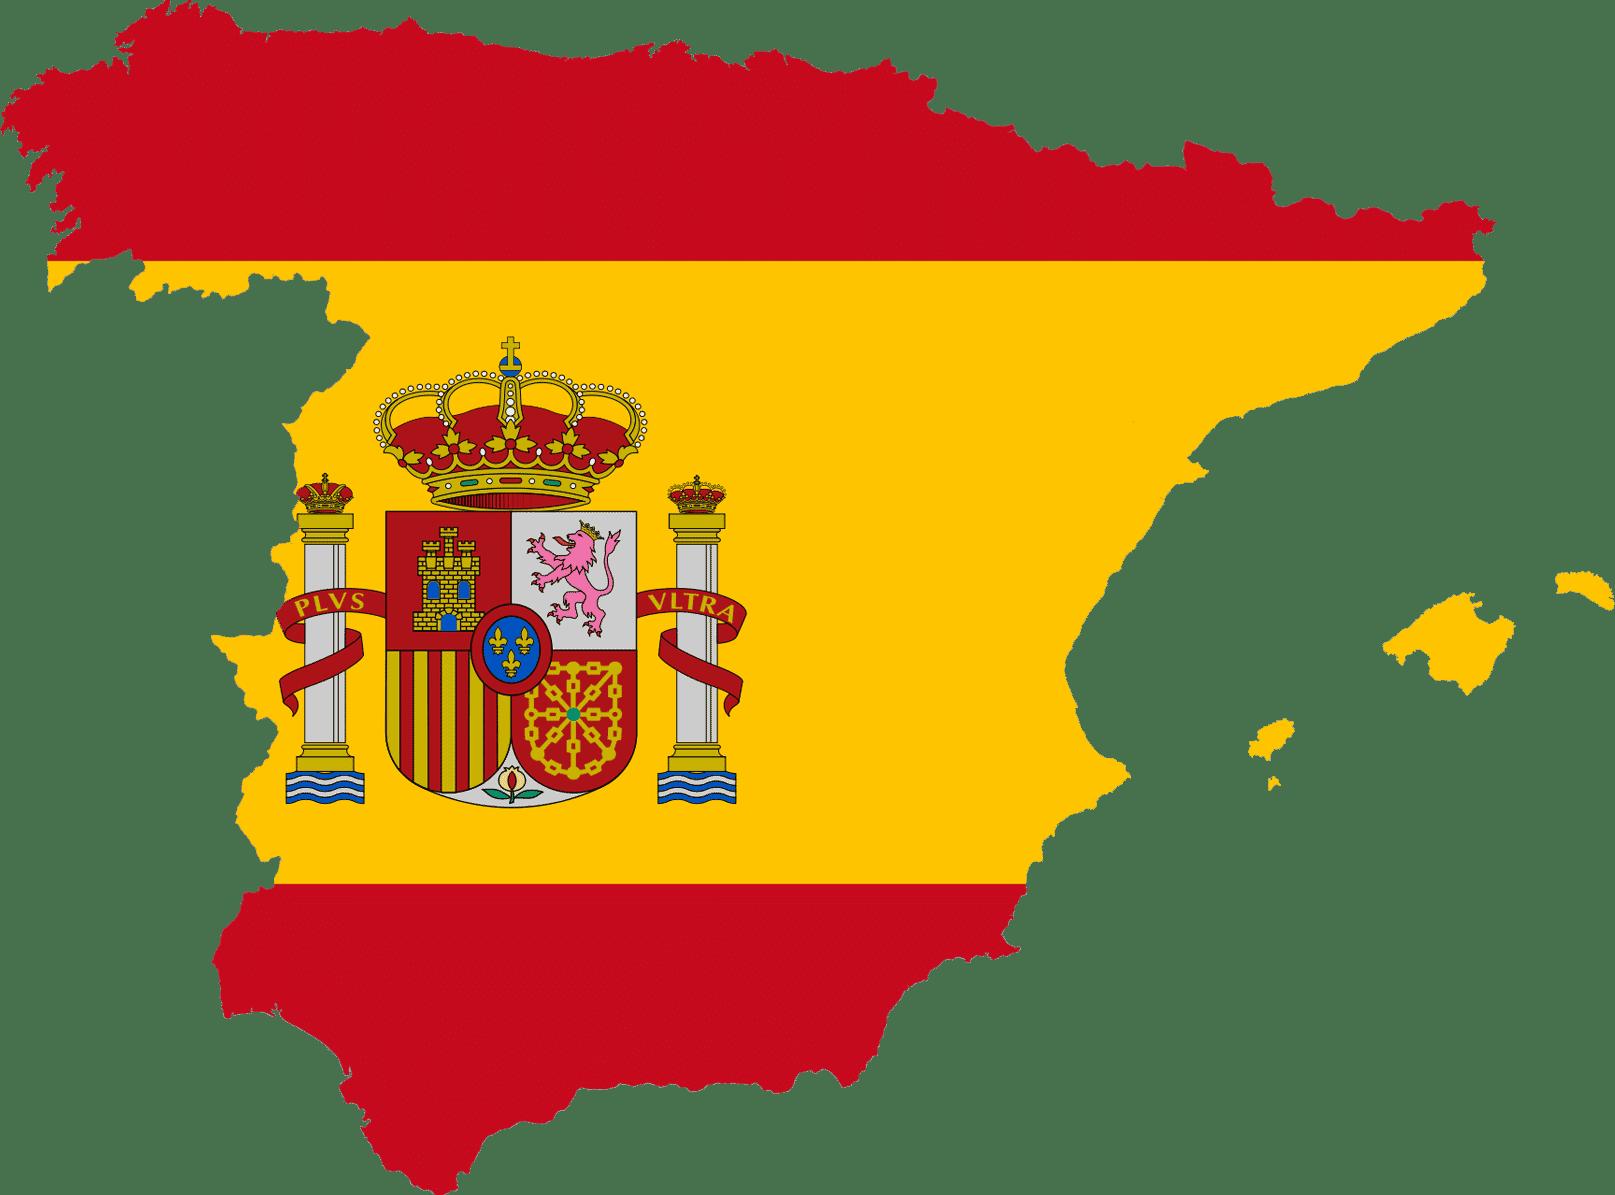 Simon's Spain Gambling Guide